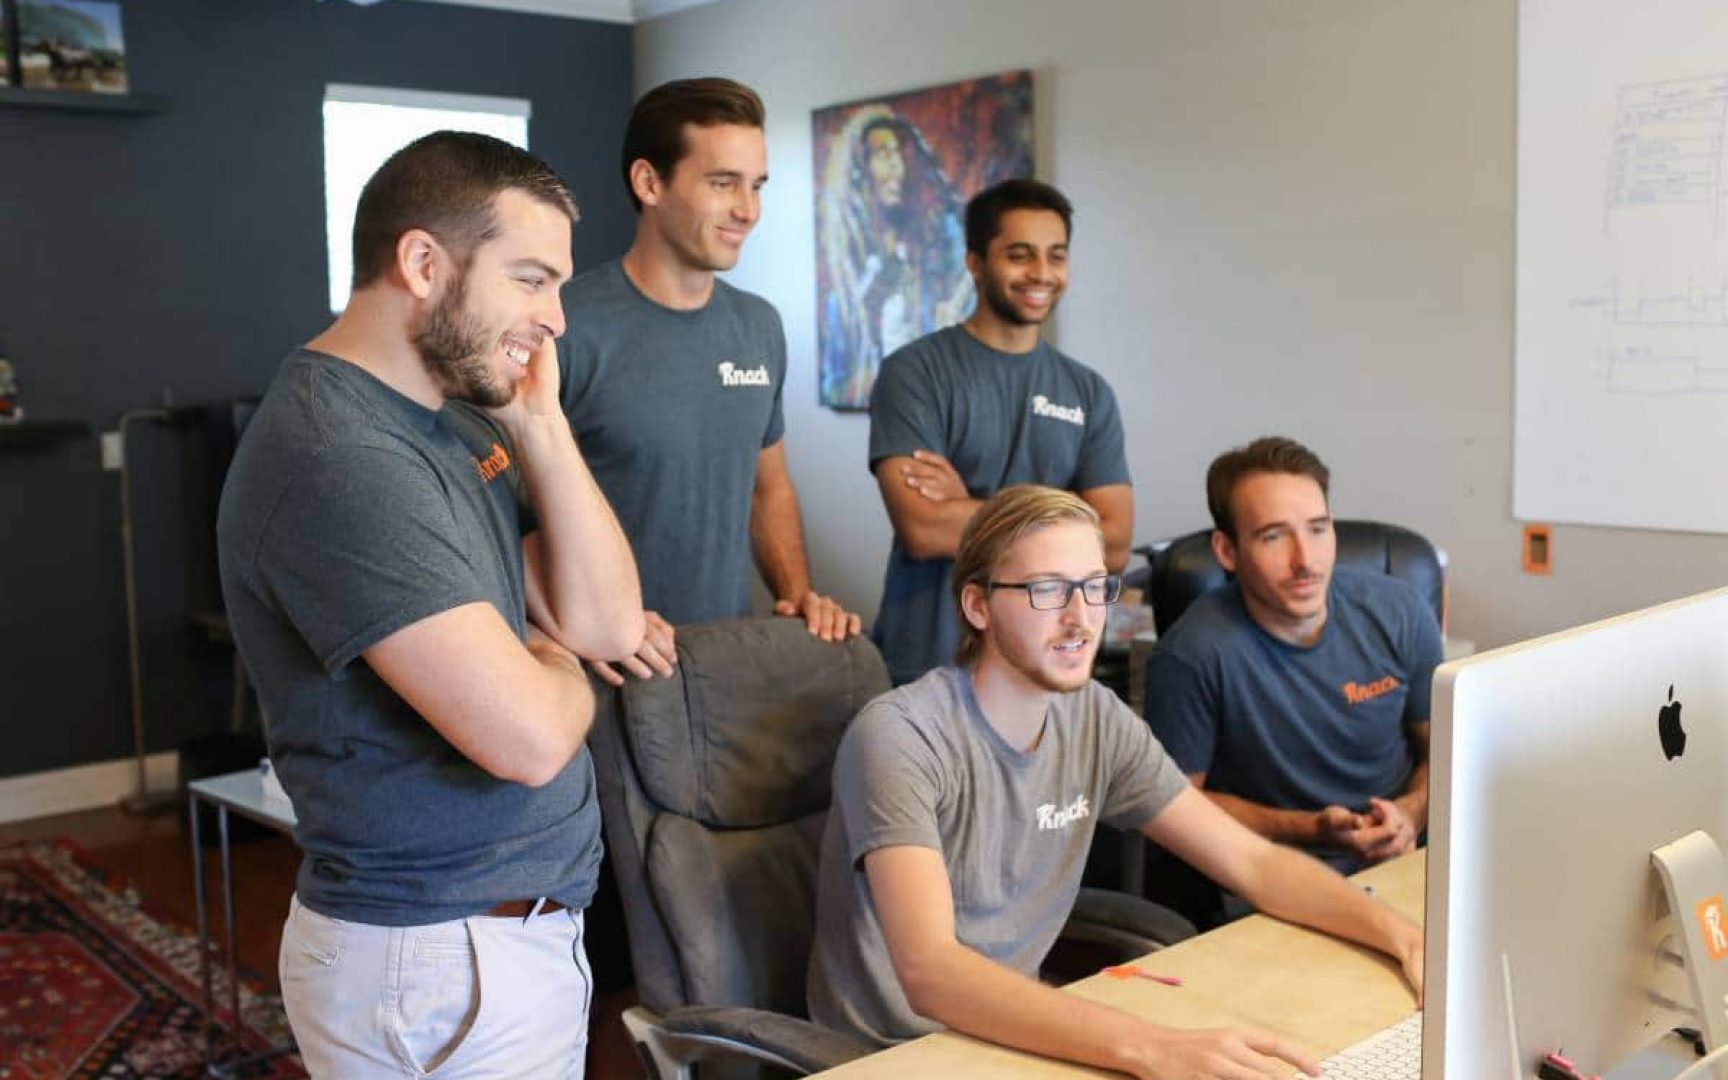 Knack team members look at a computer in their office space.